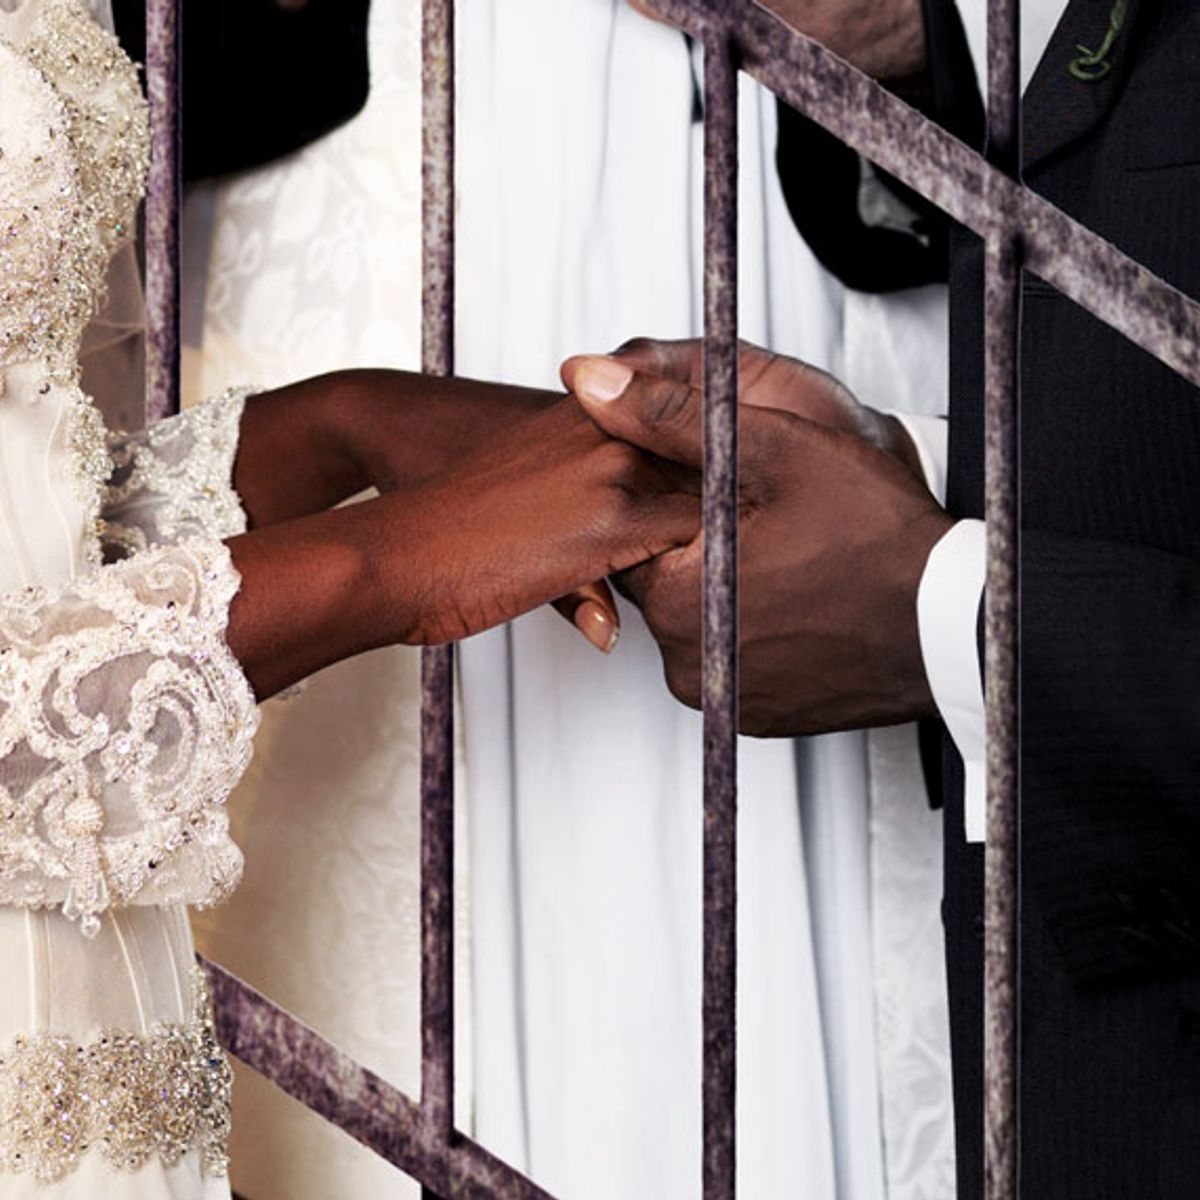 Desert bloom: My wedding day, inside a California prison